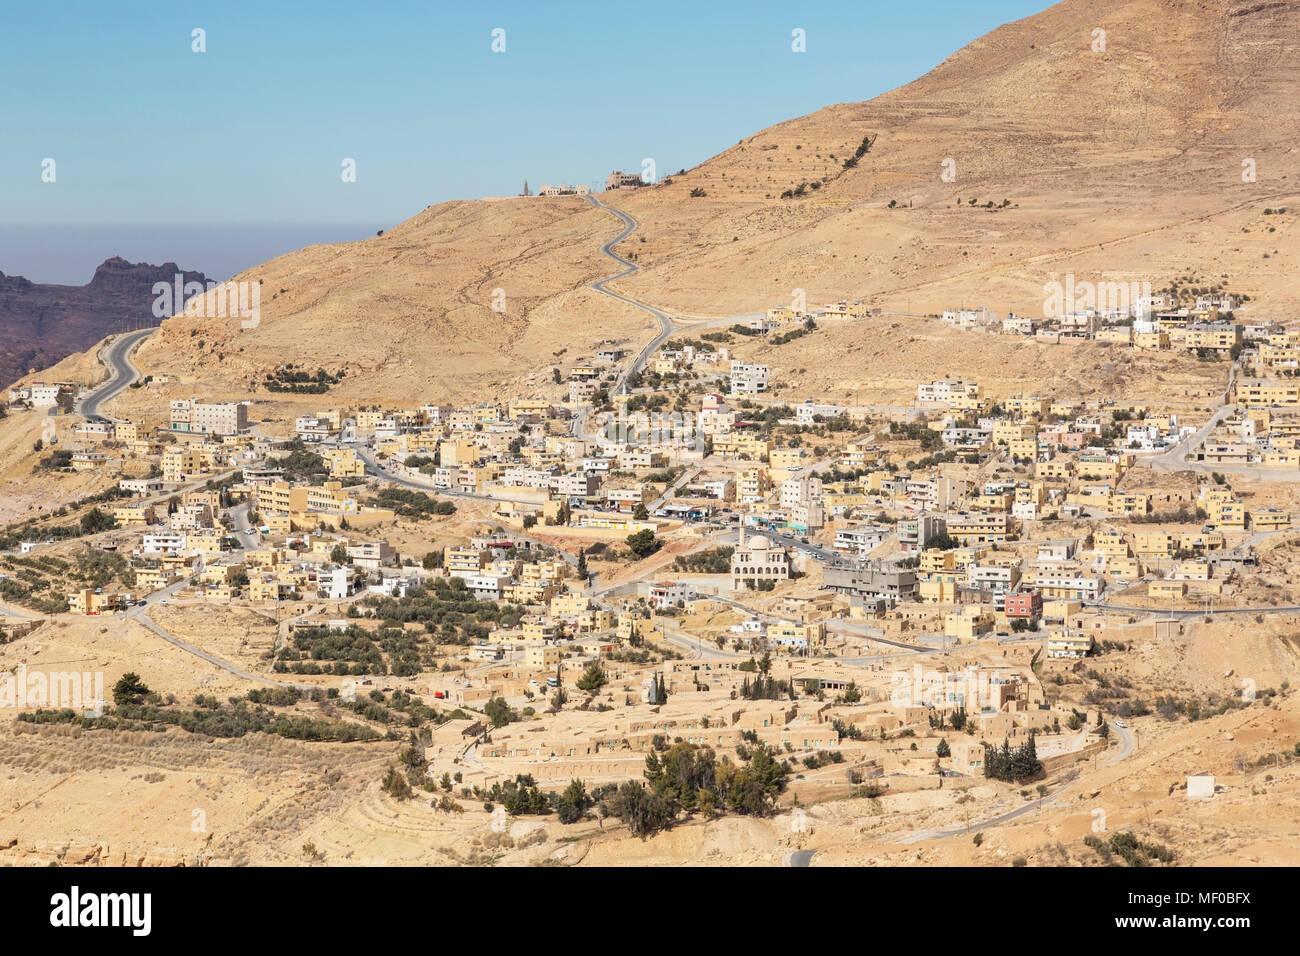 Wadi Musa, small town near Petra, Jordan - Stock Image